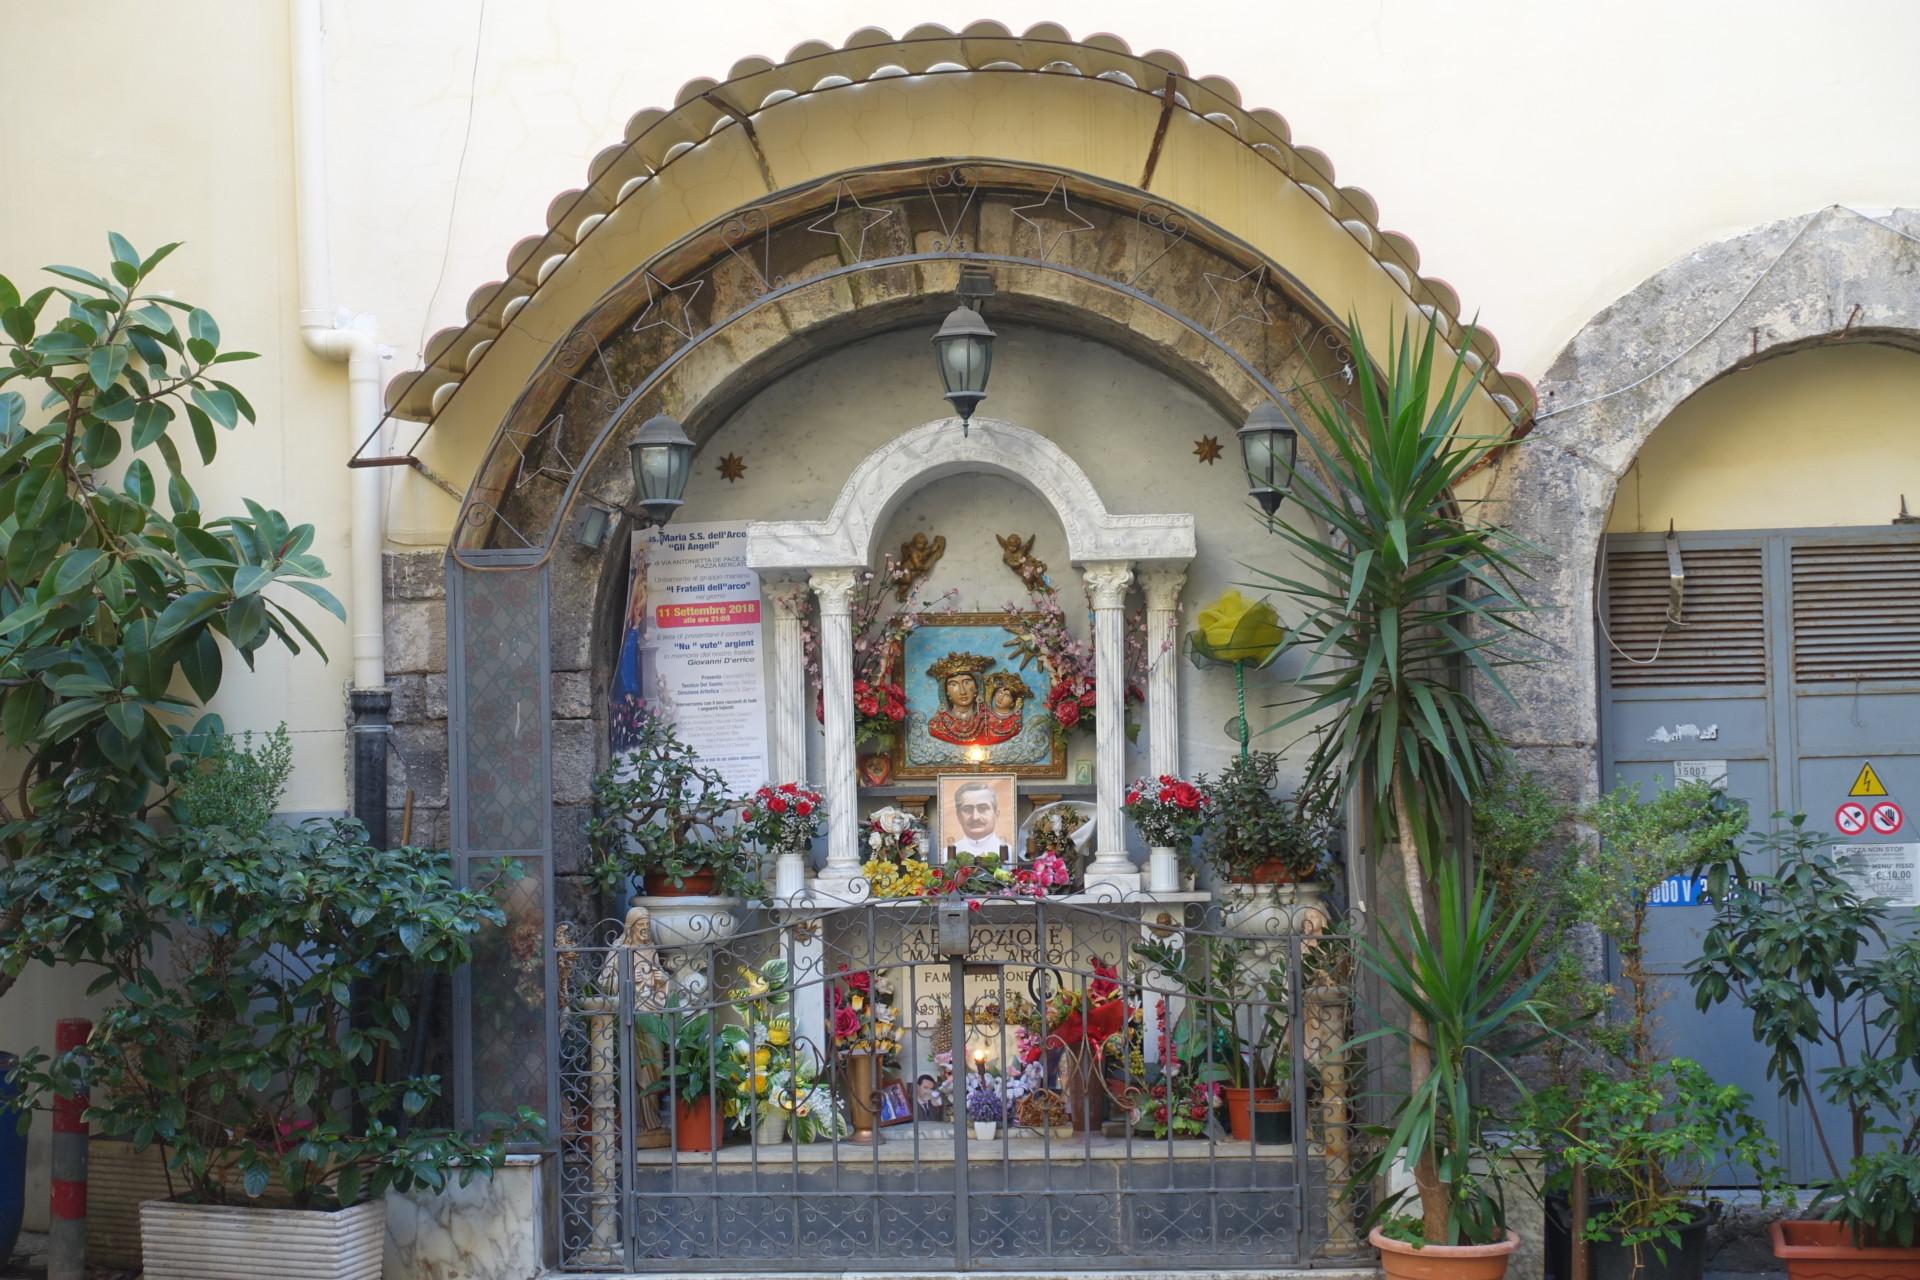 Centro storico Napoli, Strassenaltar